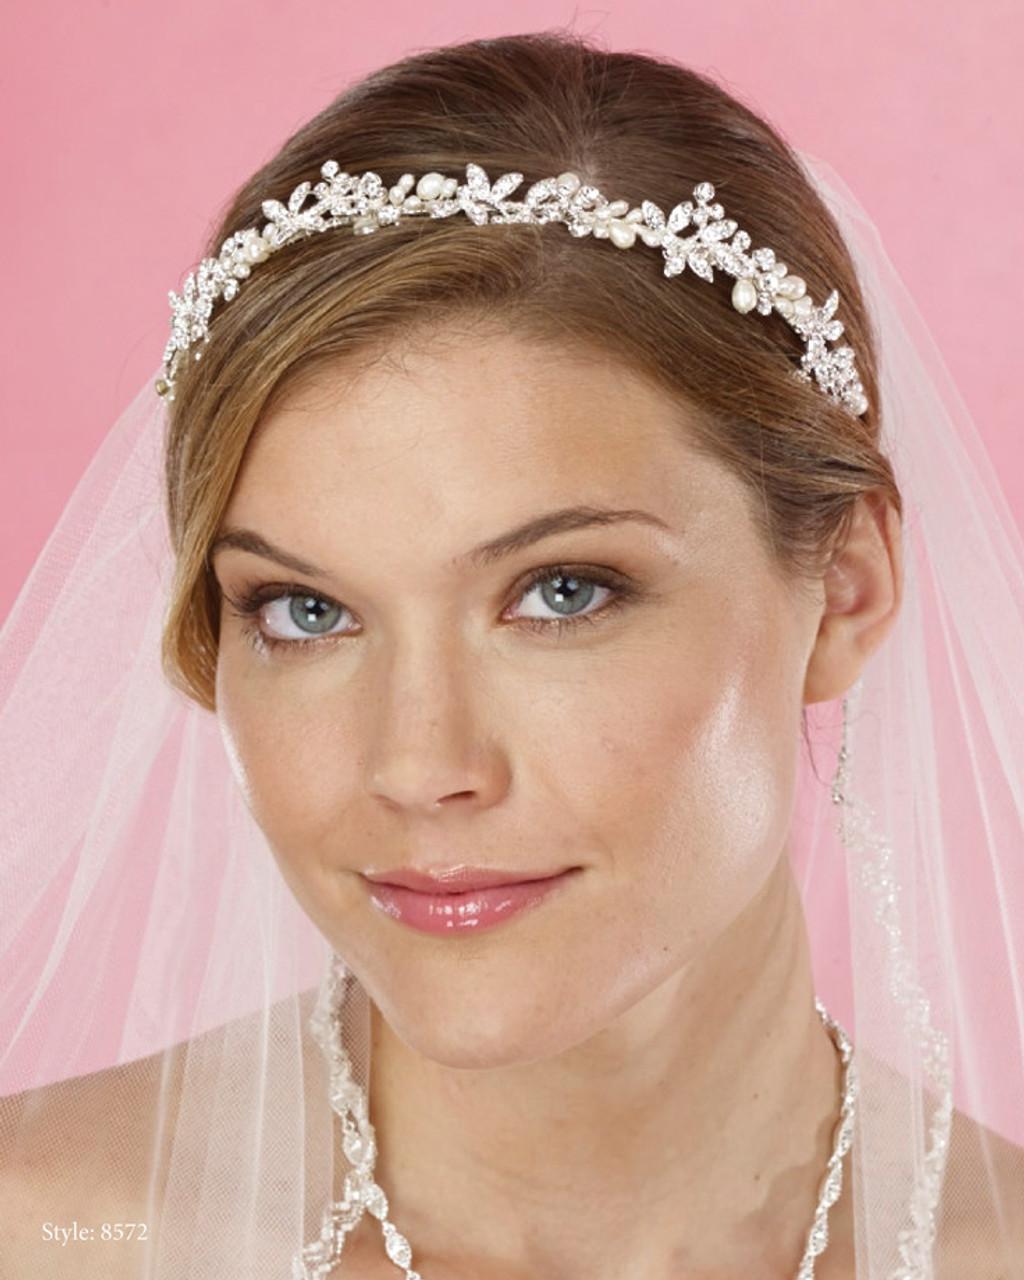 Pearl Headpieces For Brides: Marionat Bridal Headpieces Style 8572 Rhinestone Pearl